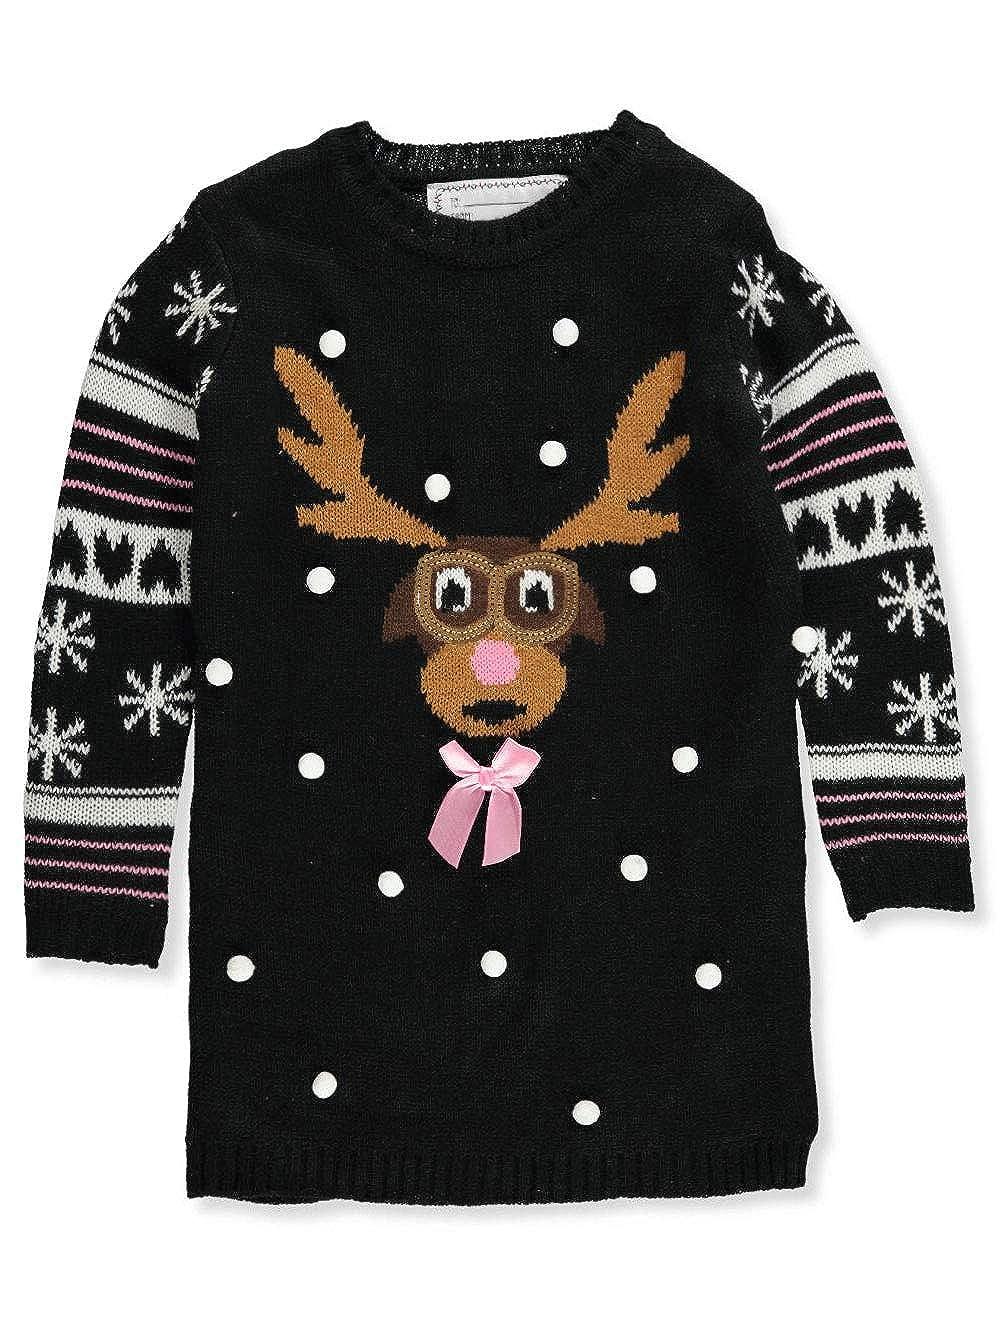 Derek Heart Girls' Sweater 6